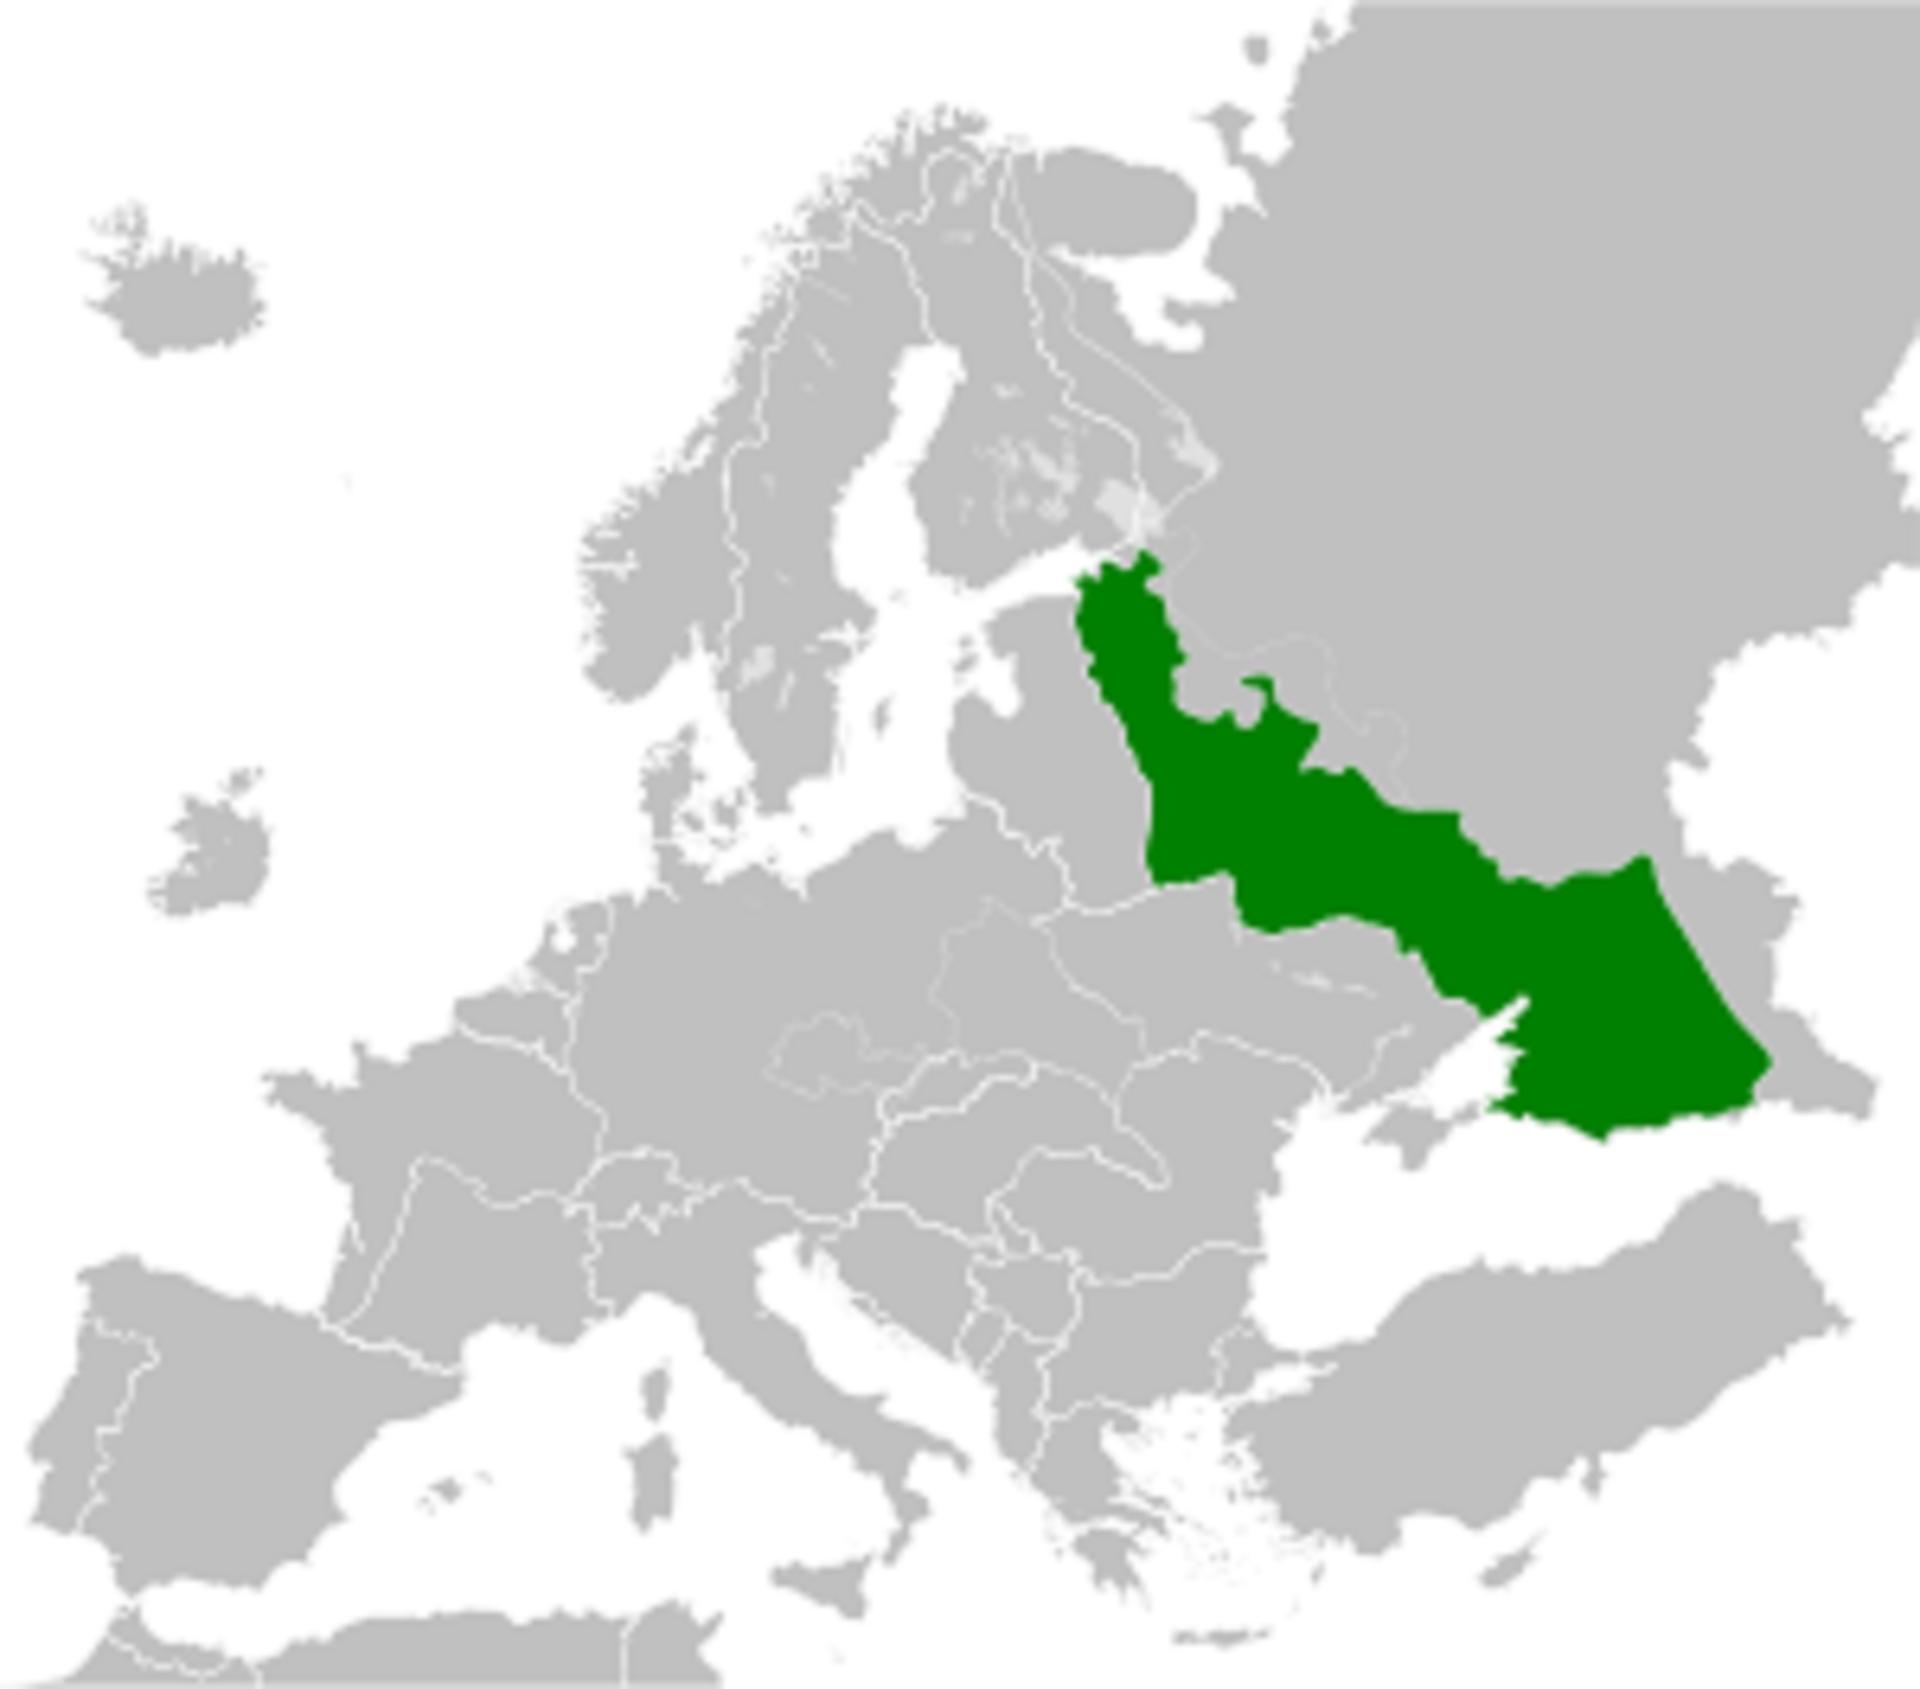 Karta prikazuje područja koja bi obuhvaćala Reichskommissariat Moskowien.